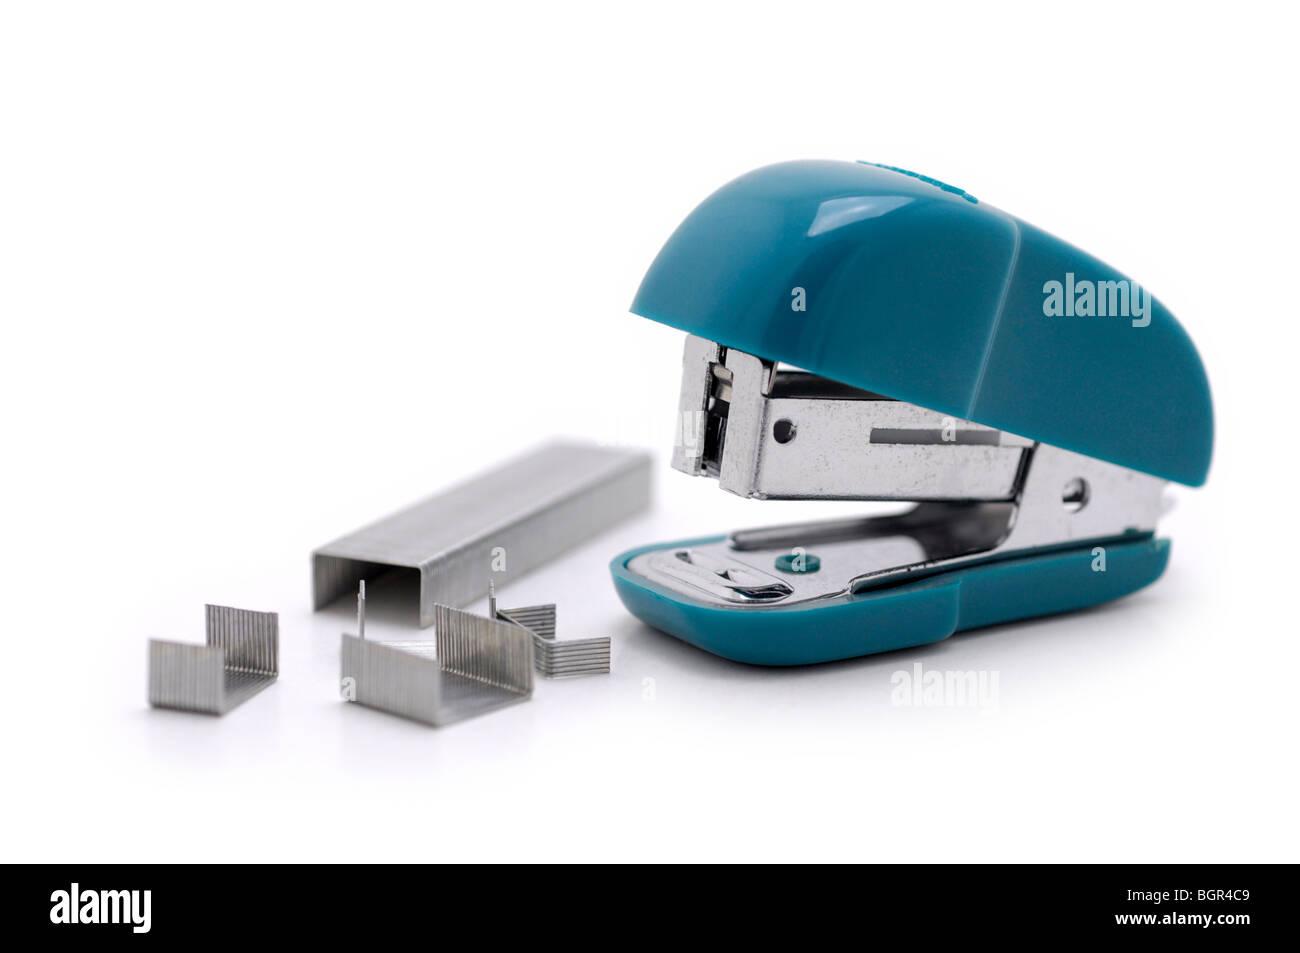 Stapler and Staples - Stock Image